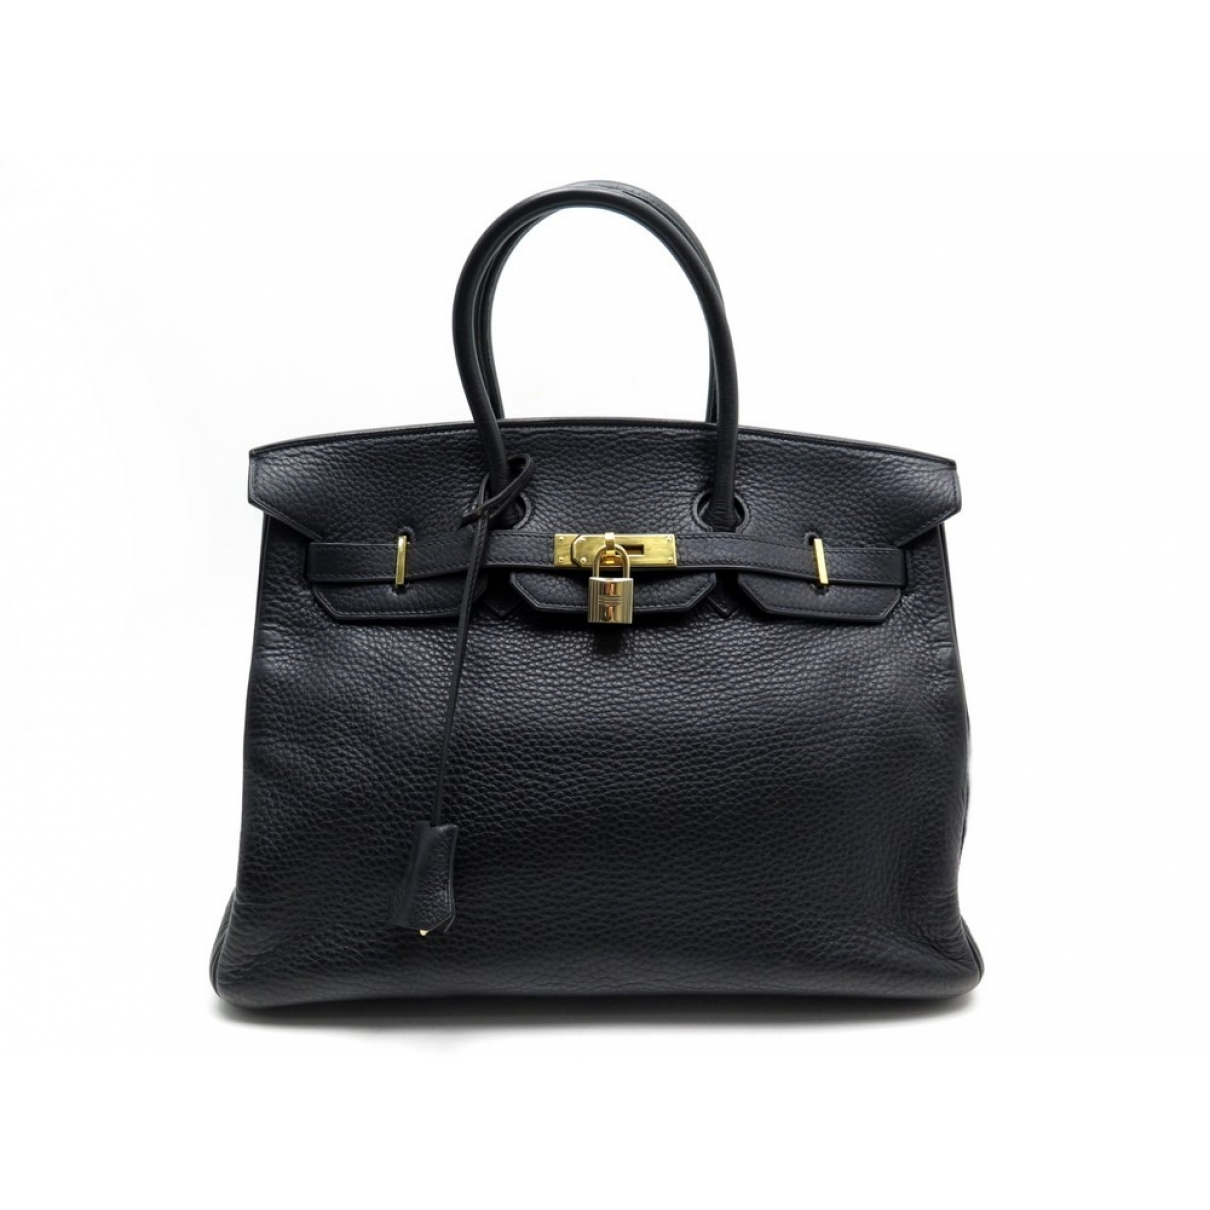 Hermes - Sac a main Birkin 35 pour femme en cuir - noir